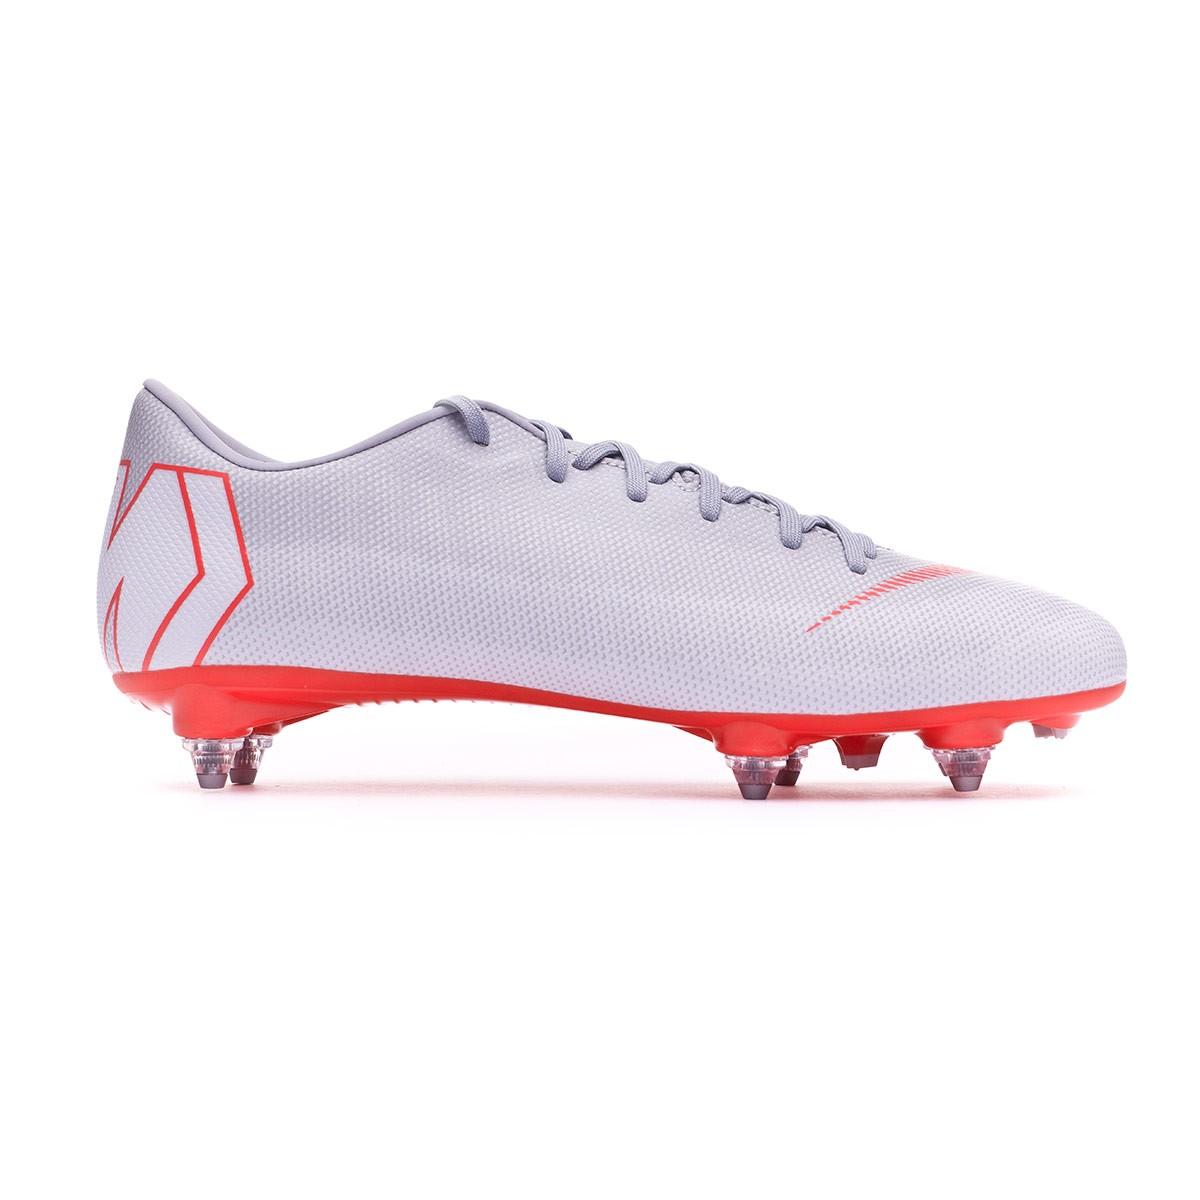 4da2fb05a Football Boots Nike Mercurial Vapor XII Academy SG-Pro Wolf grey-Light  crimson-Pure platinum - Tienda de fútbol Fútbol Emotion